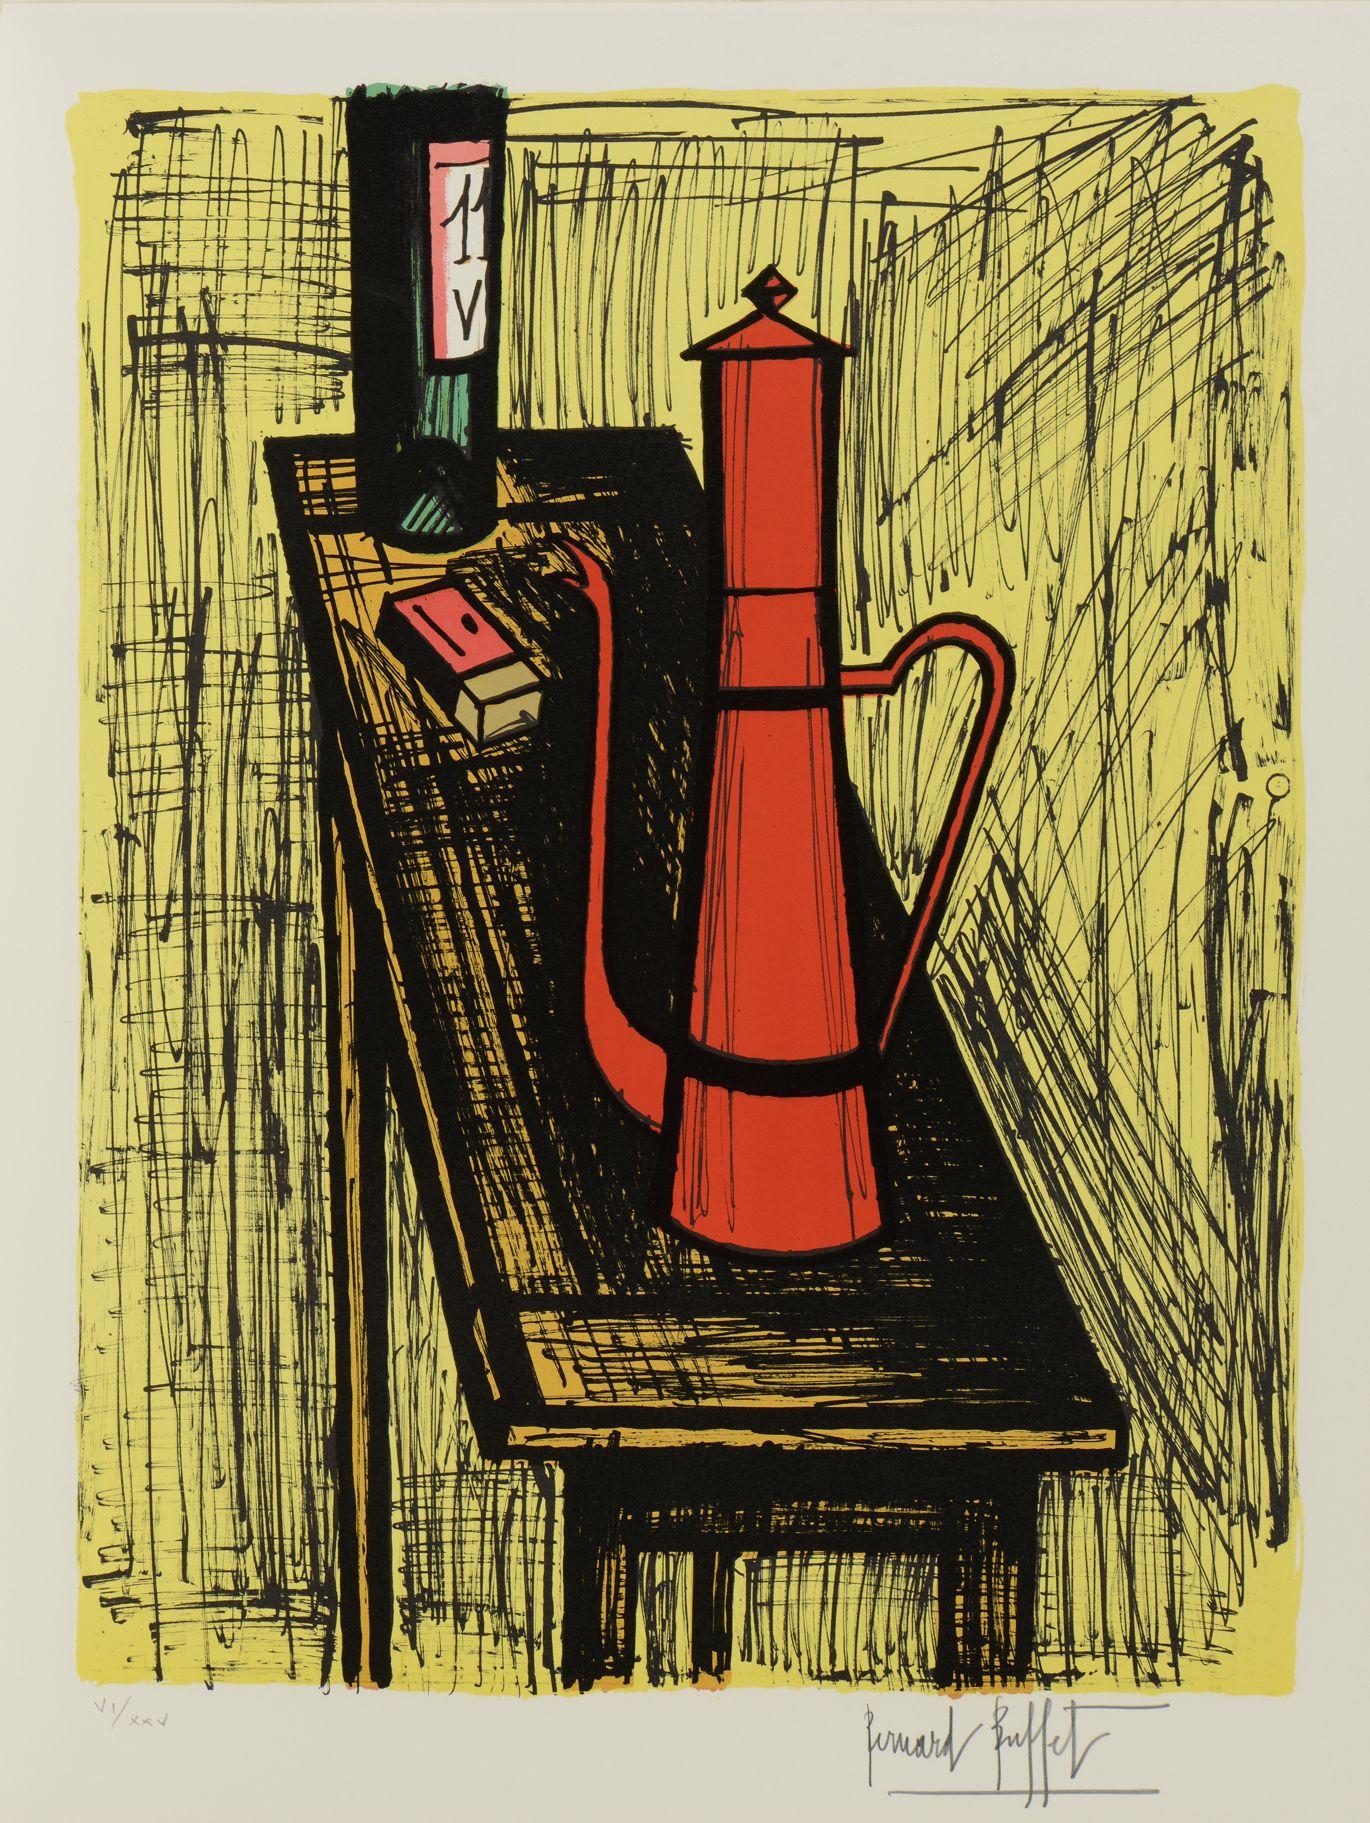 Estampe/Affiche - BUFFET Bernard (1928-1999) - Artprecium | Peintre, Peinture contemporaine et ...